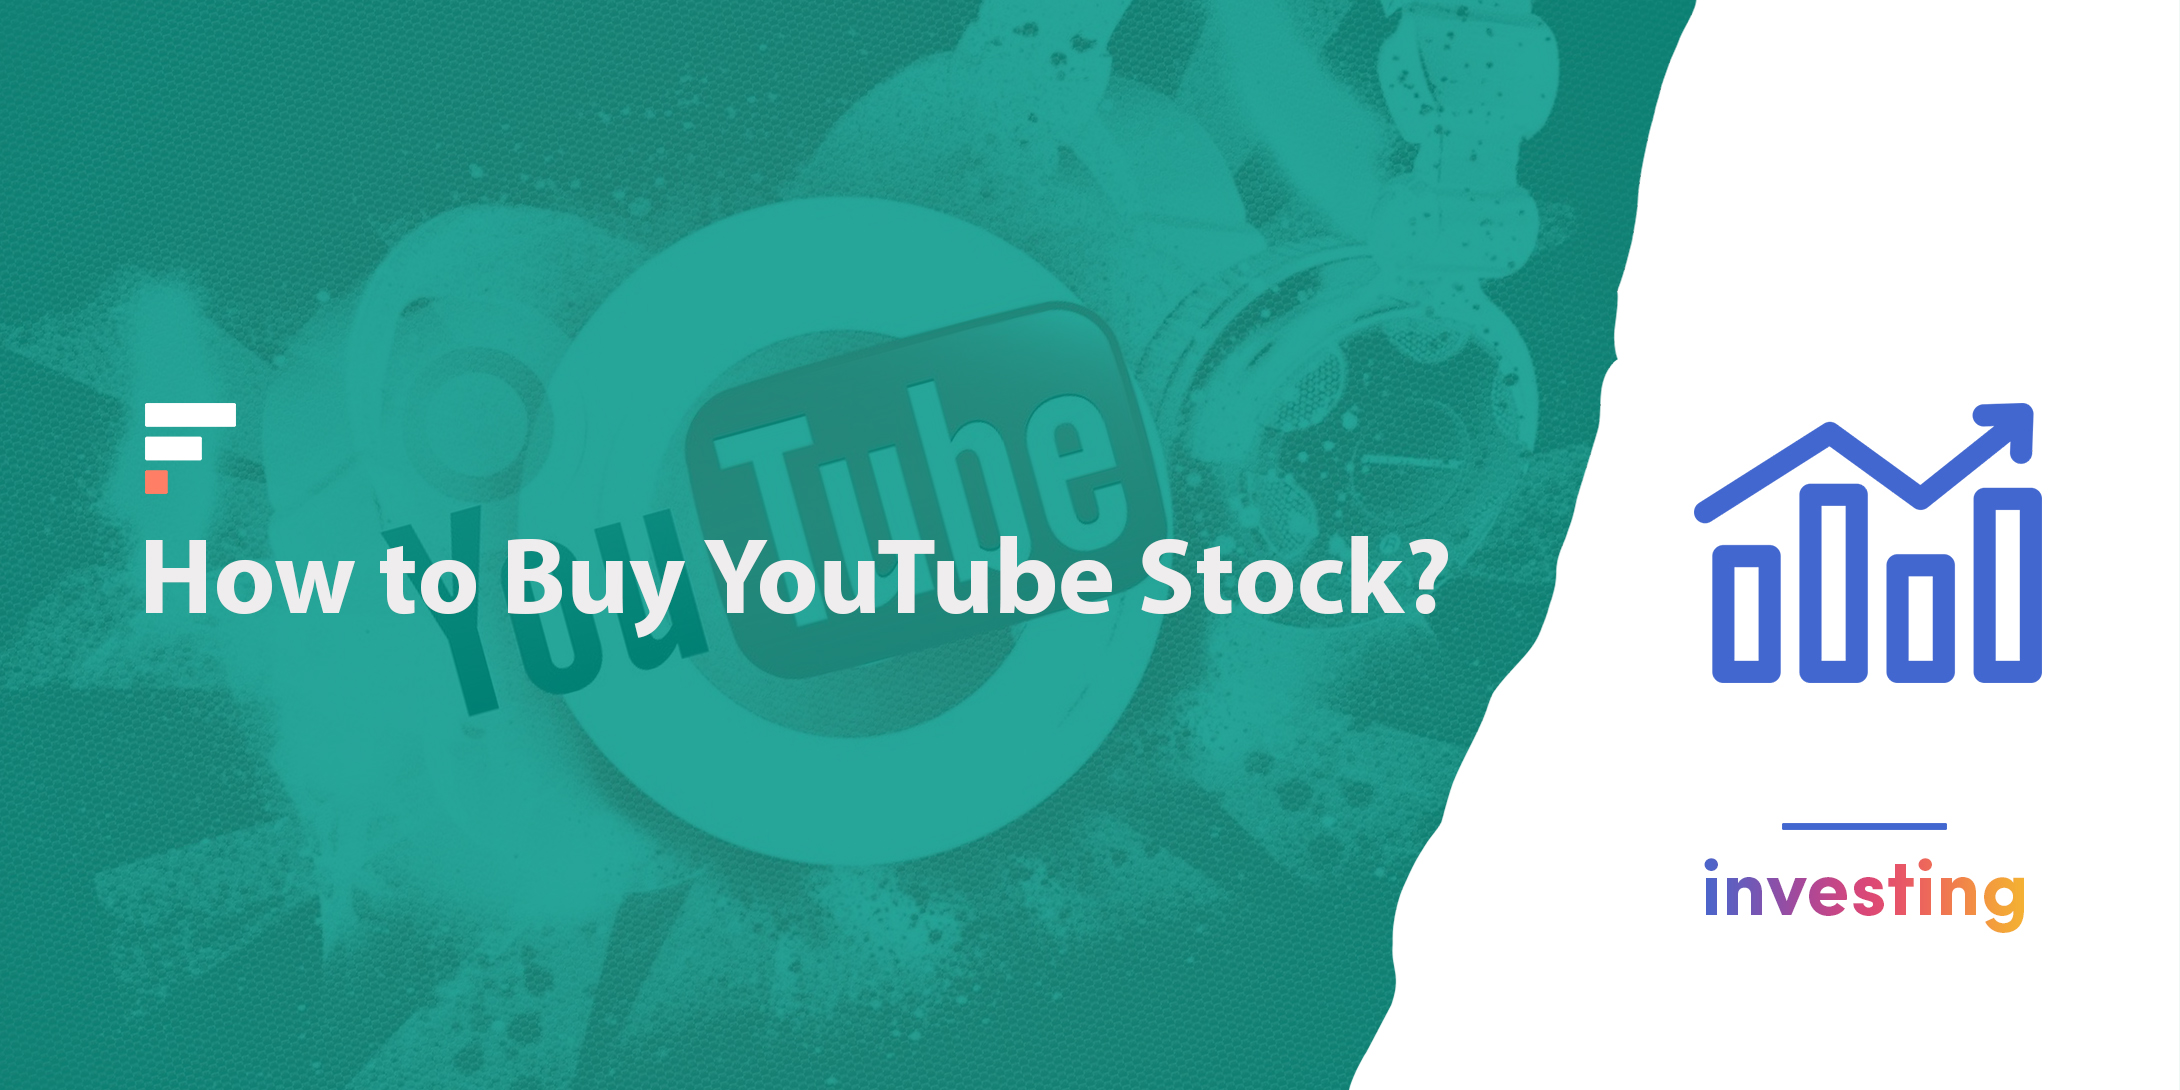 How to buy YouTube stock?